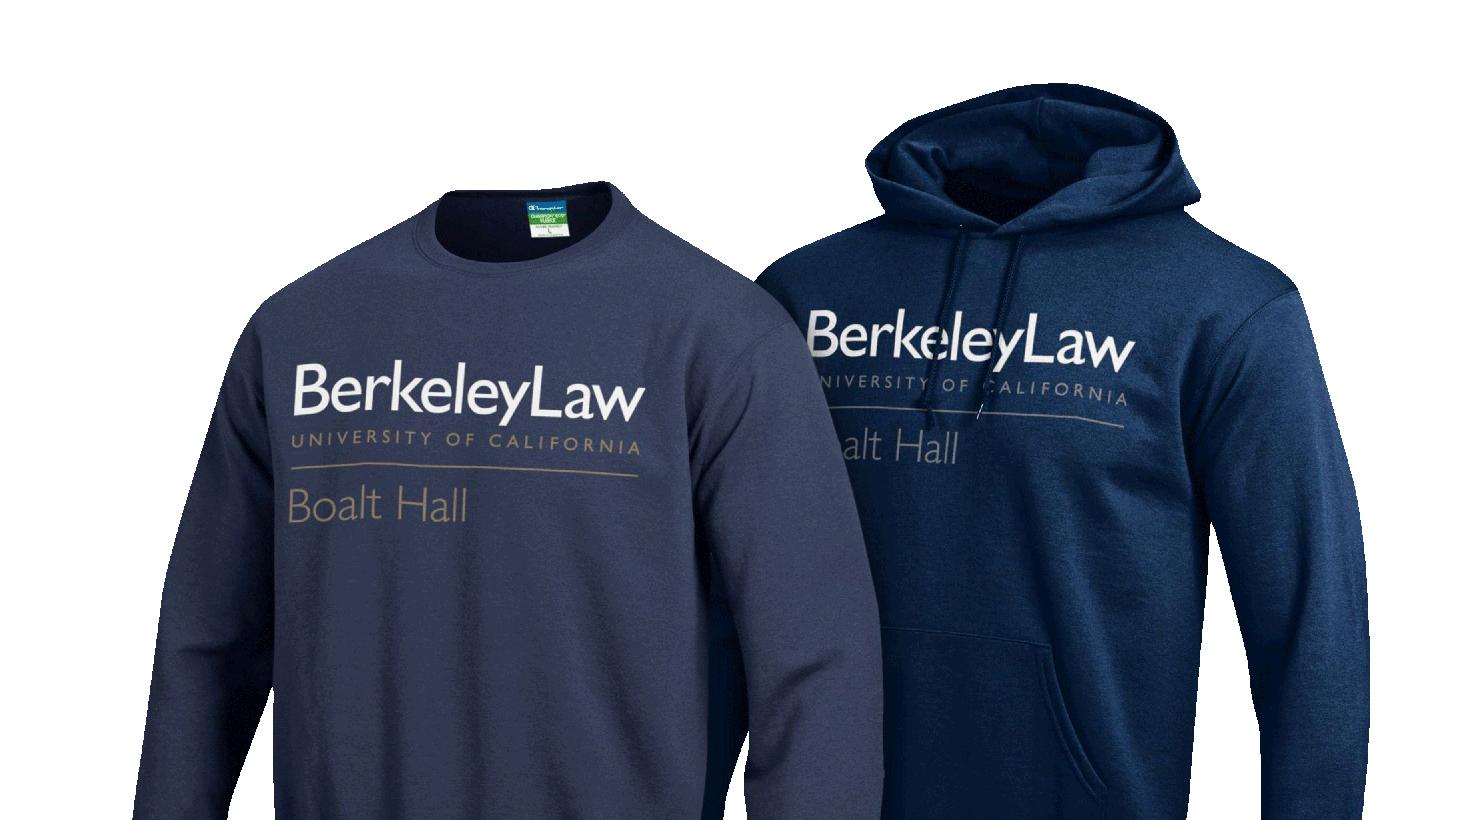 e62922cc UC Berkeley School of Law Bookstore Apparel, Merchandise, & Gifts